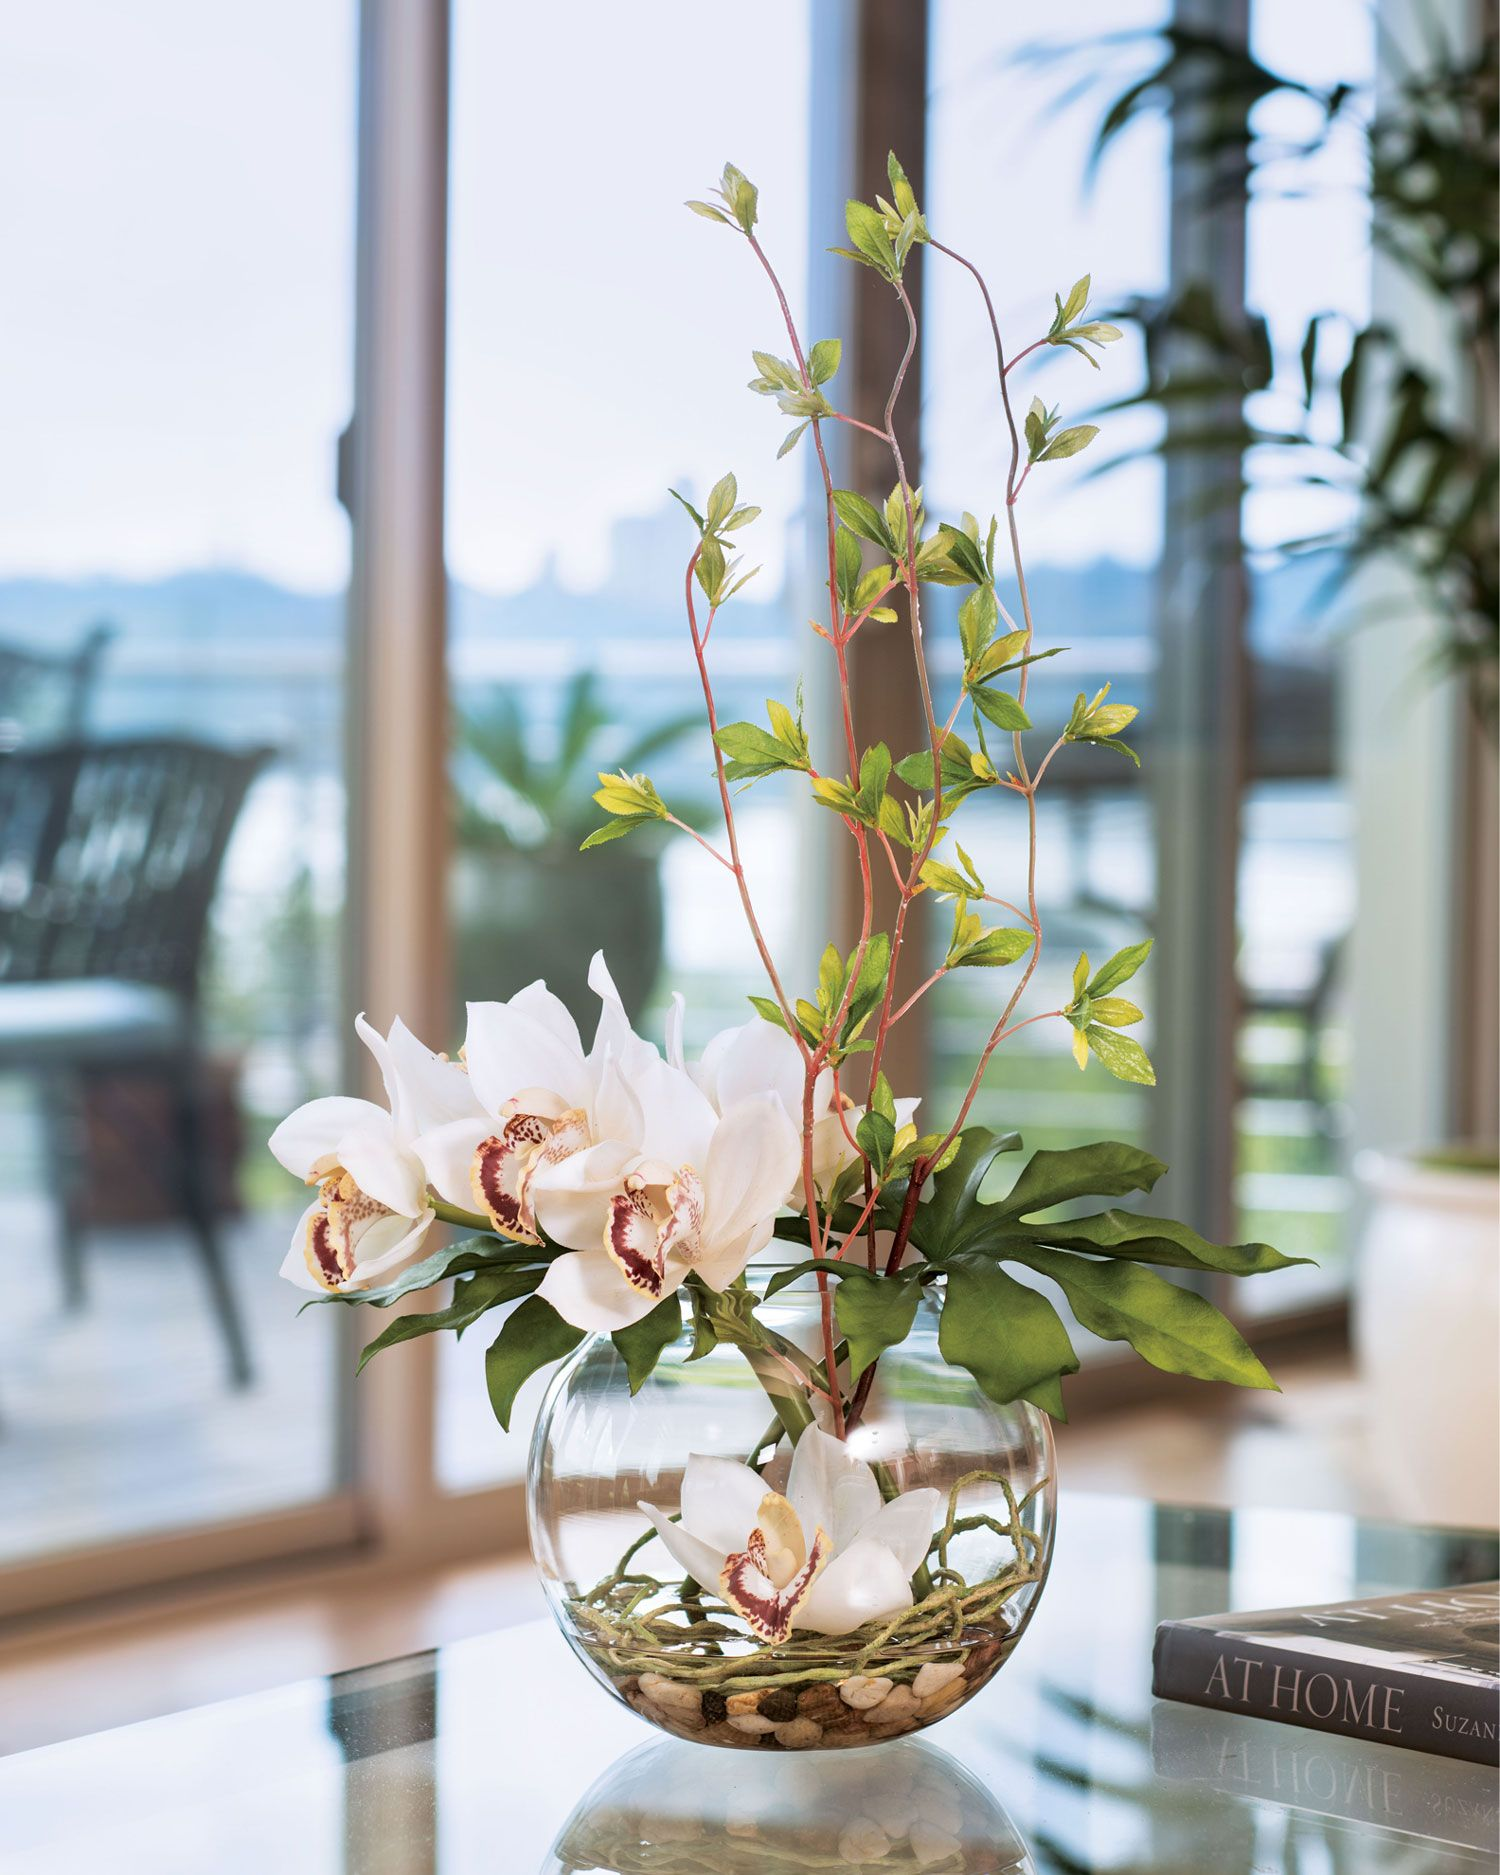 Cymbidium Orchid & Monstera Leaf Silk Flower Arrangement